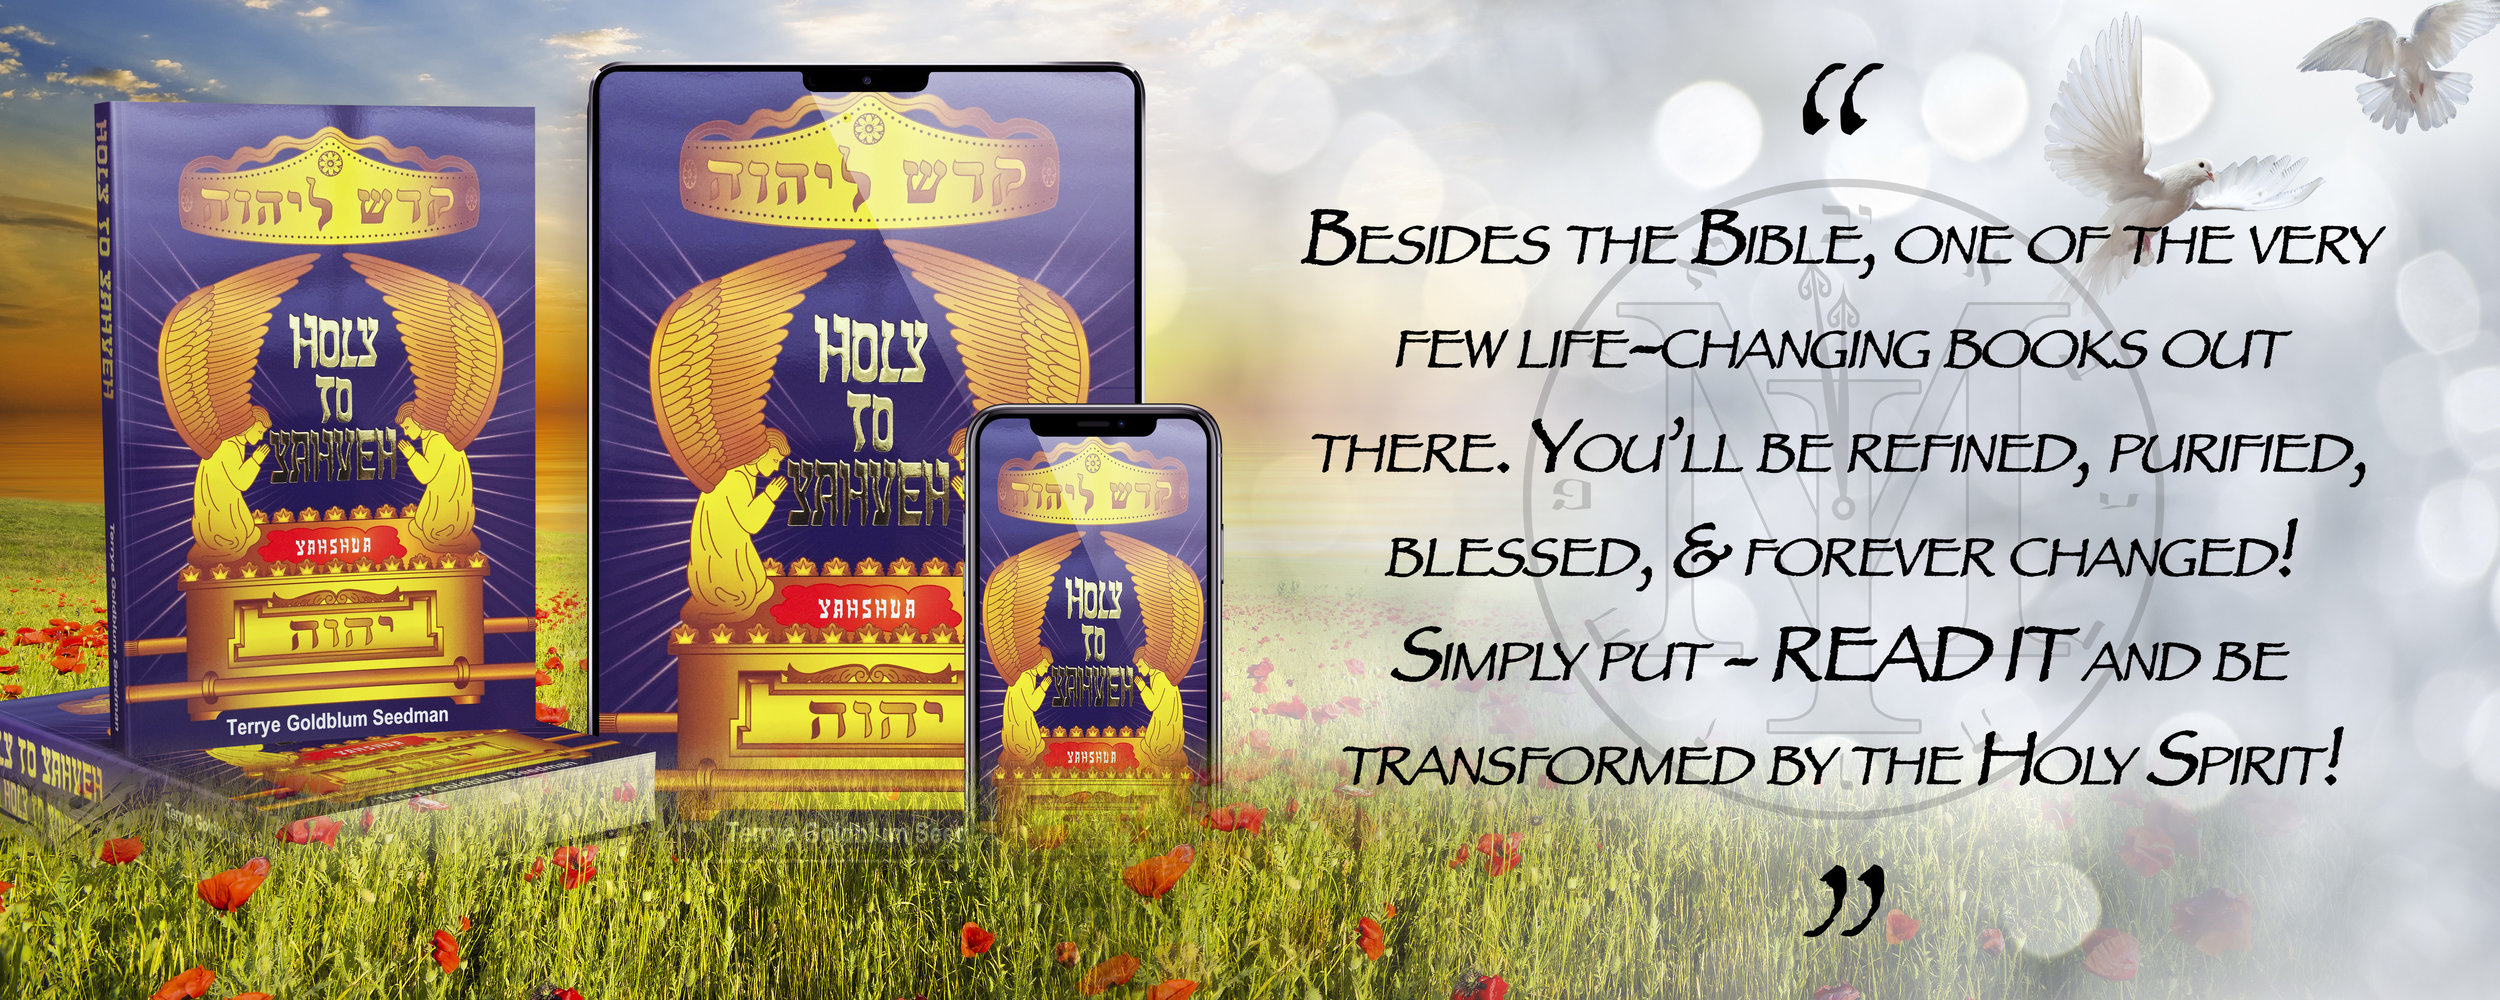 Testimonial 2 - Holy to Yahveh.jpg